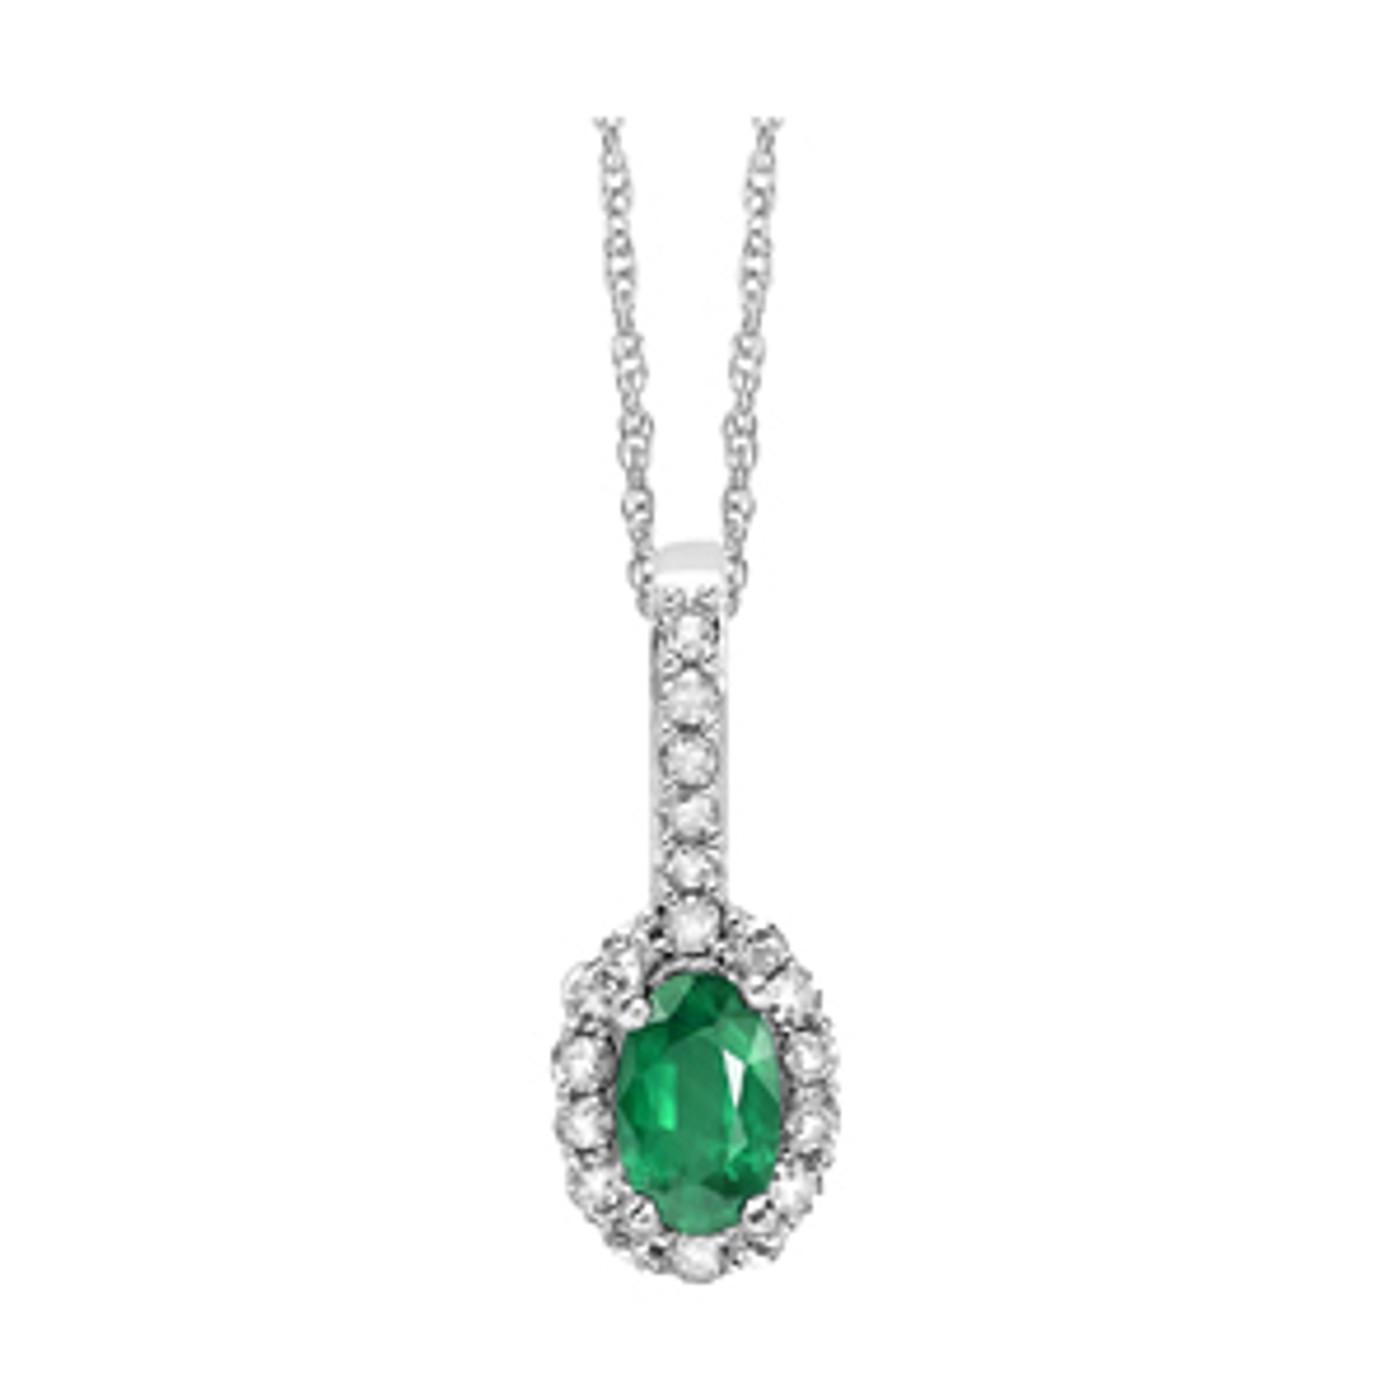 "14k White Gold Oval Emerald & Diamond Halo Necklace 18"" Chain"